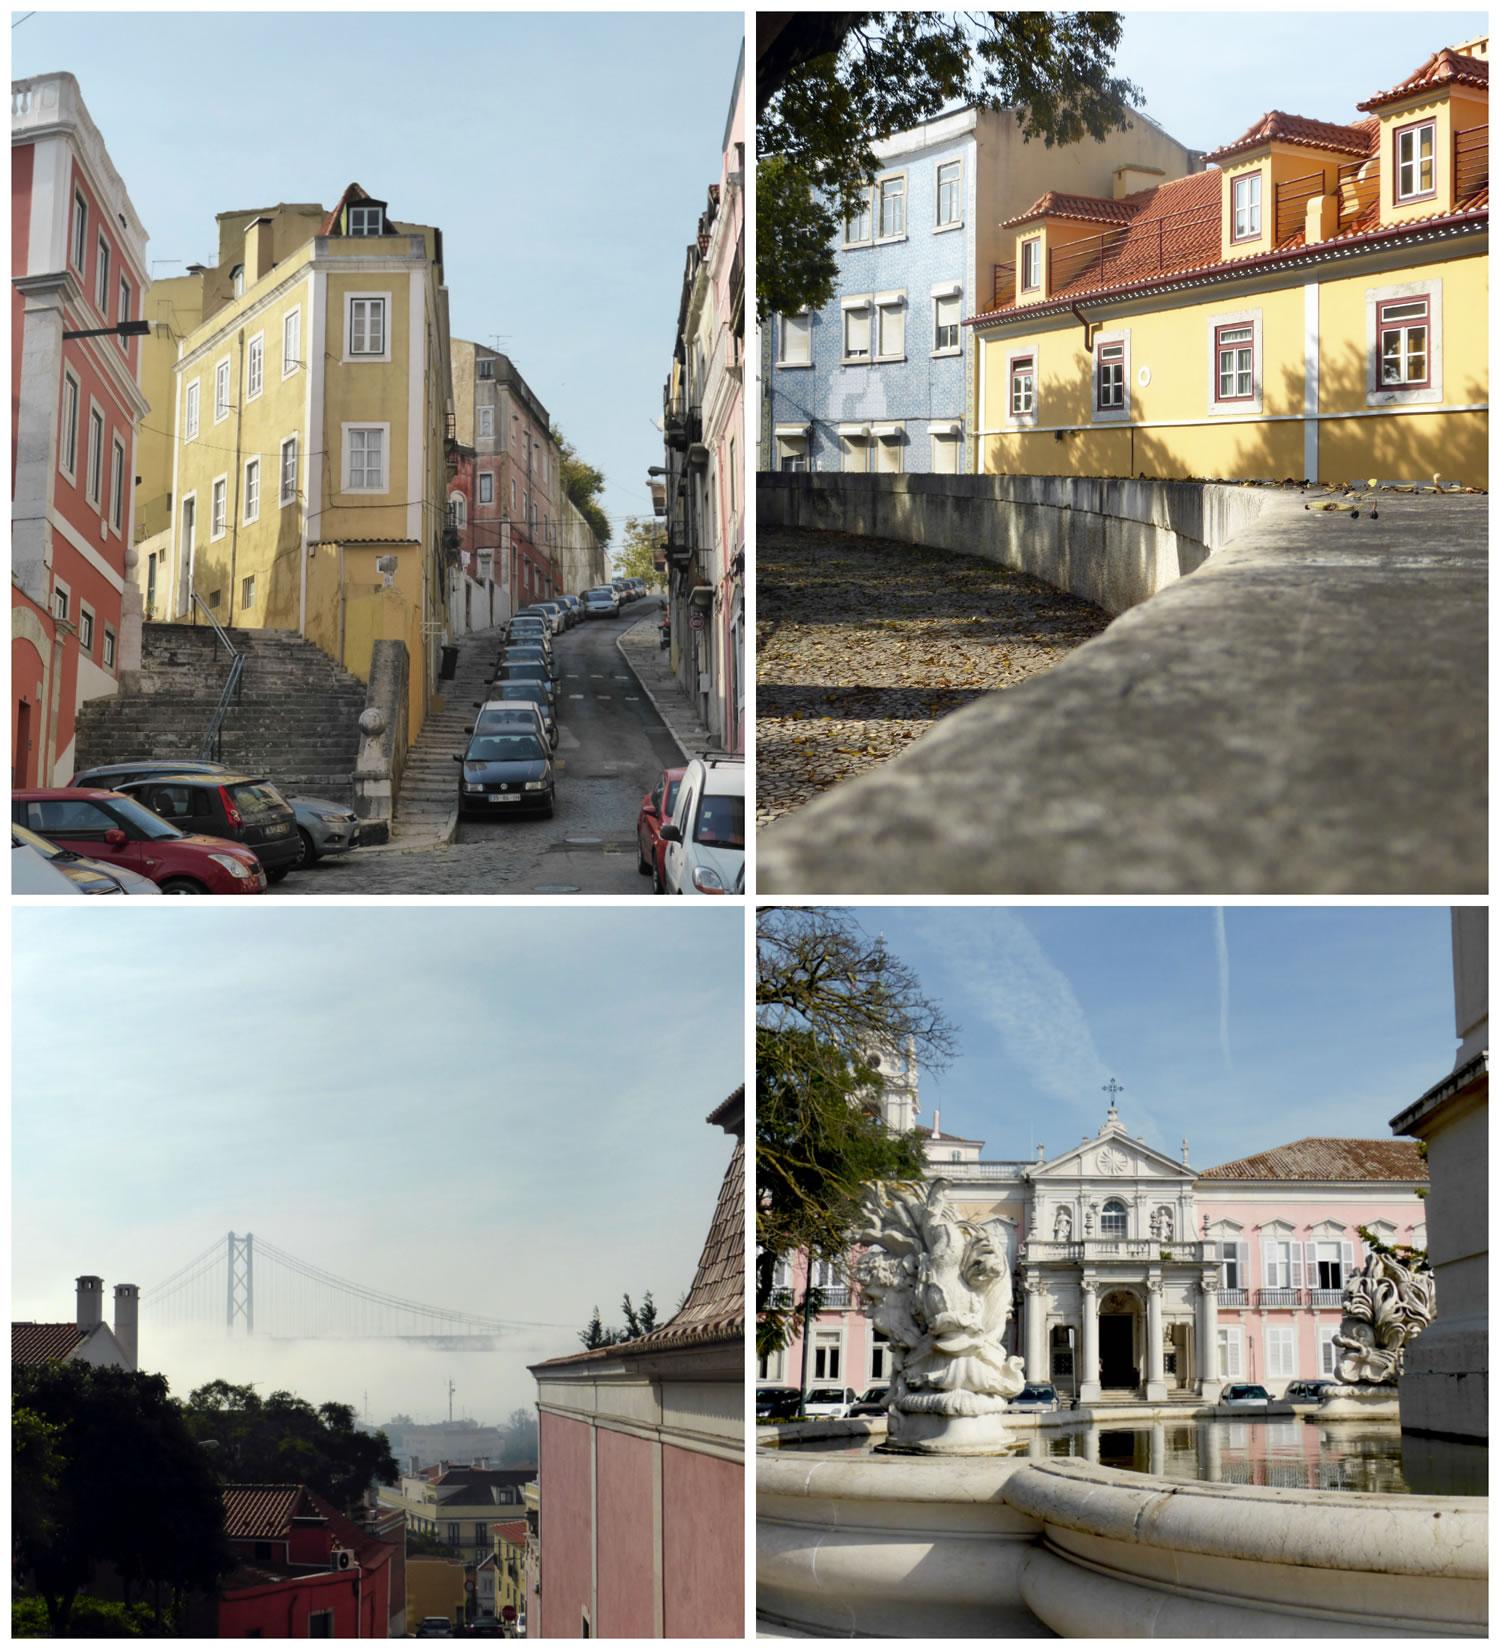 Lisbonne_Portugal_Alcantara